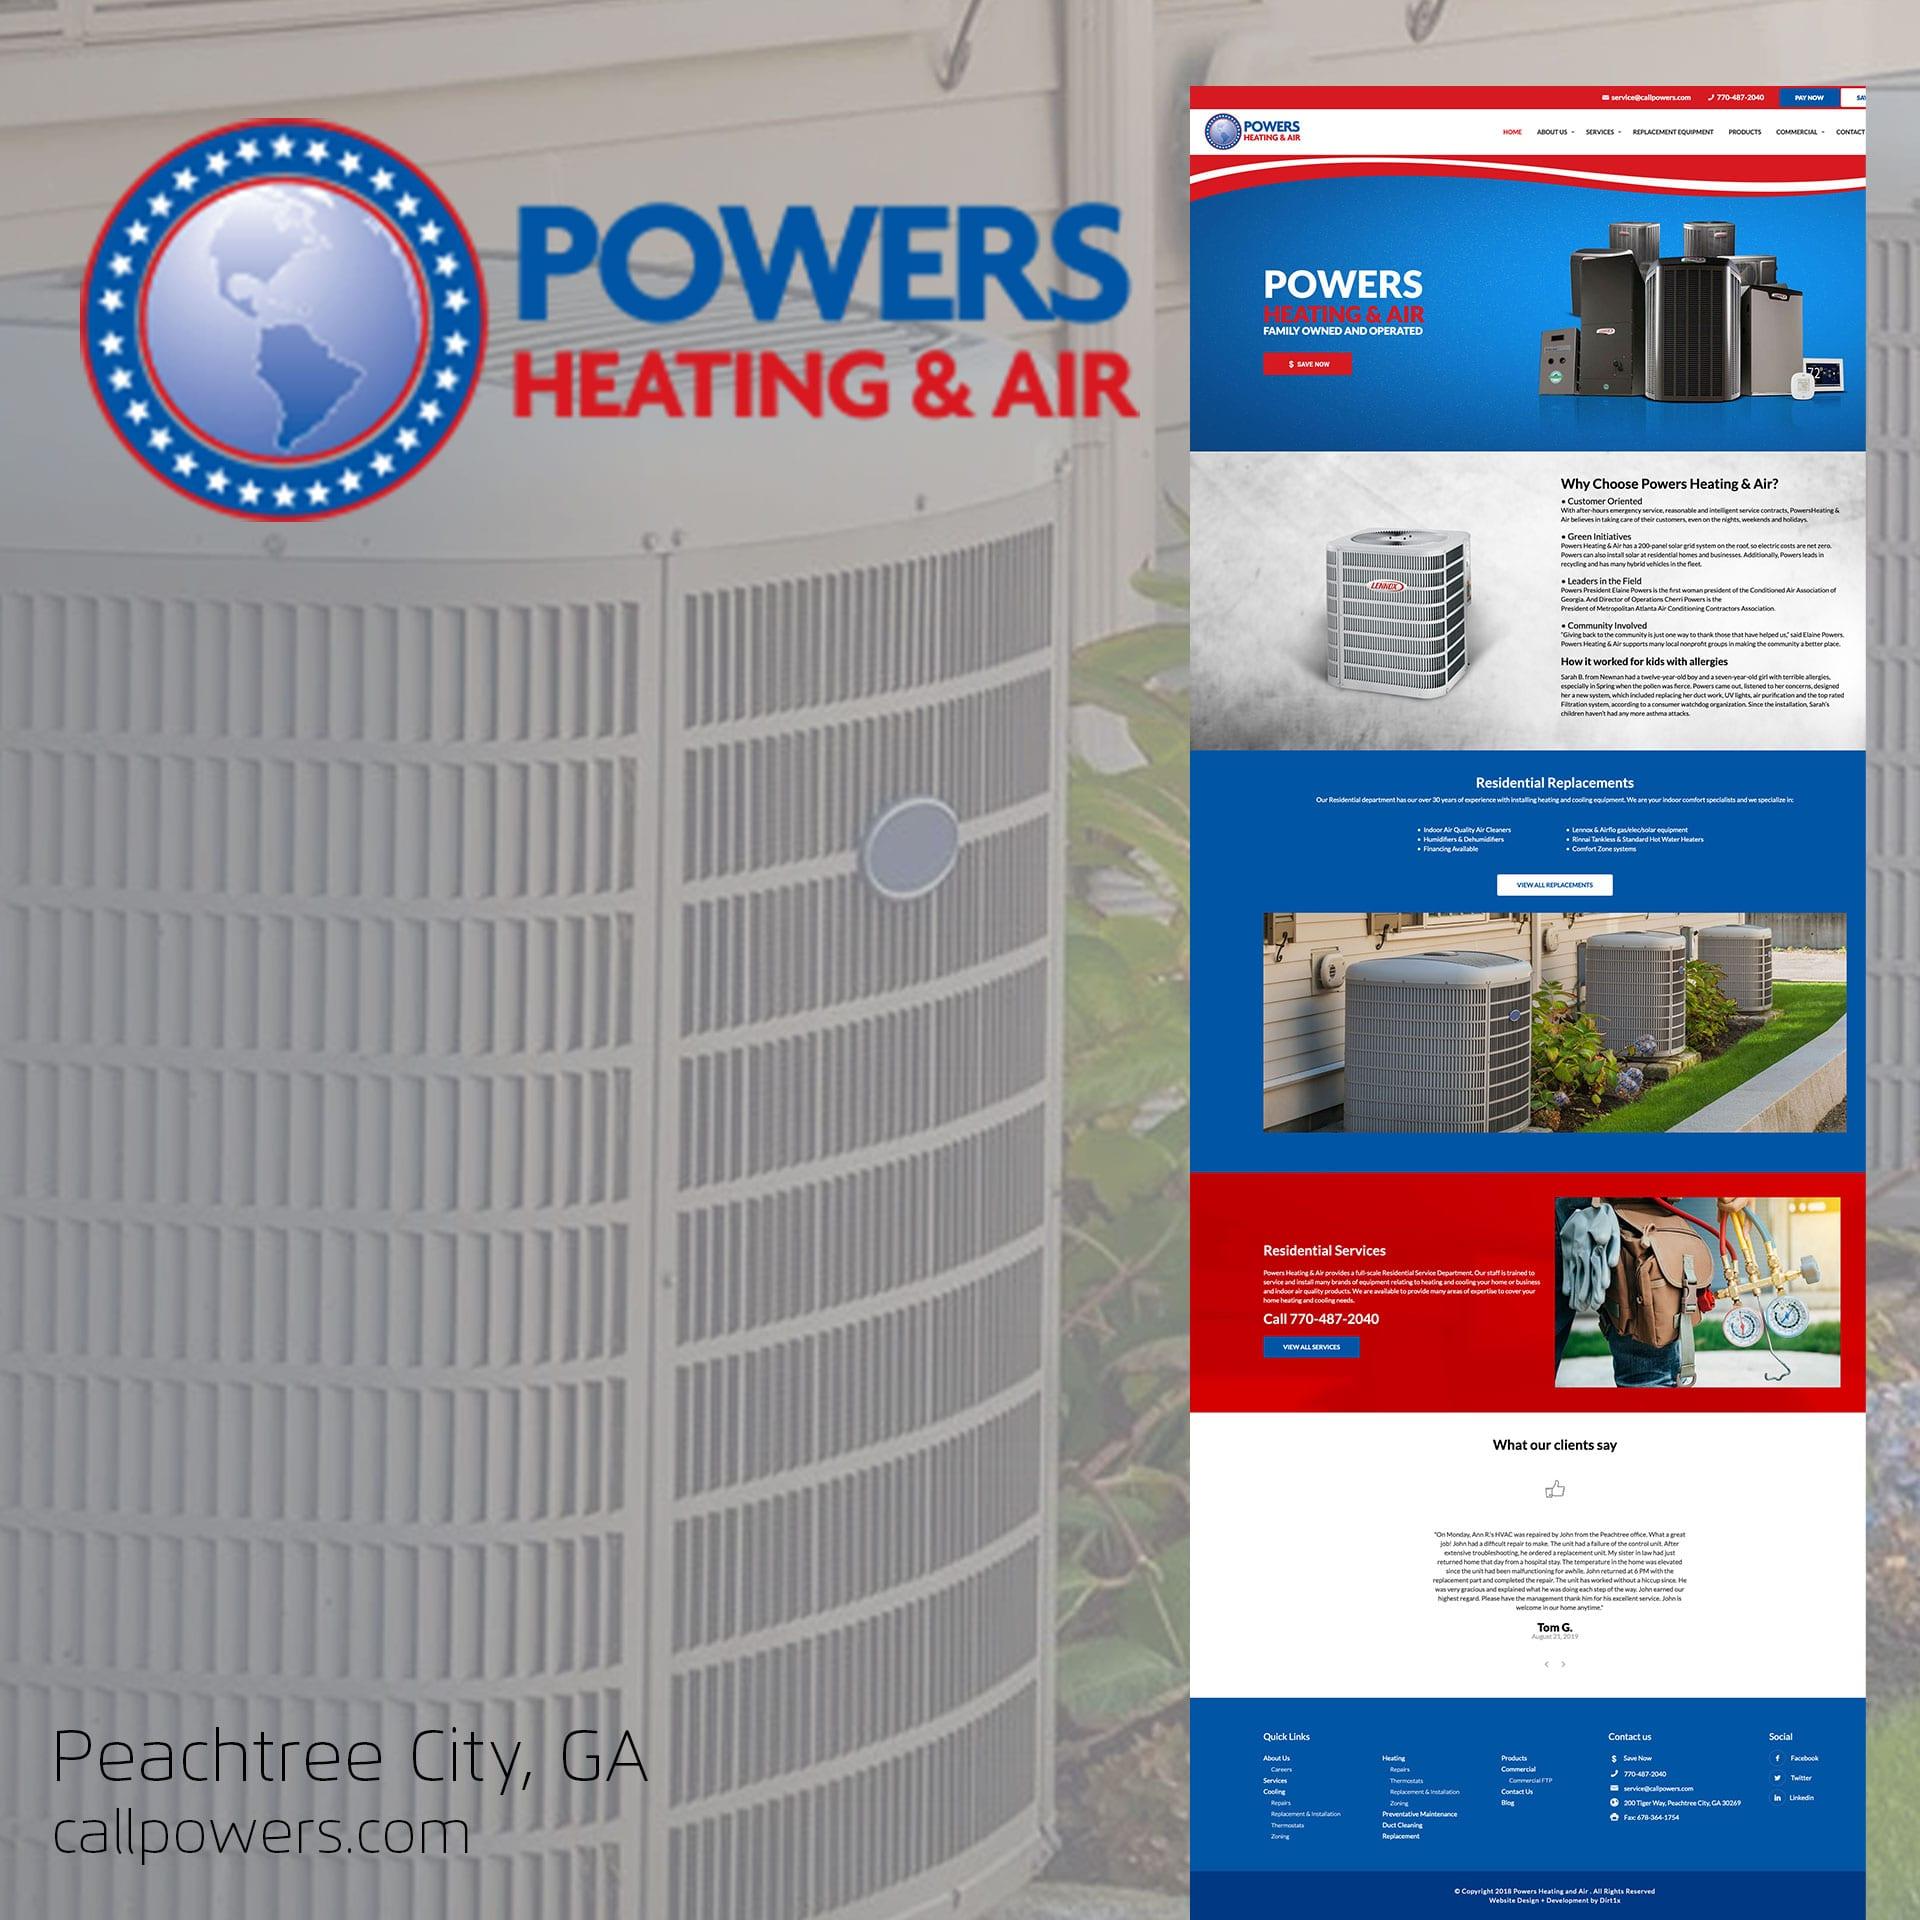 Powers Heating & Air